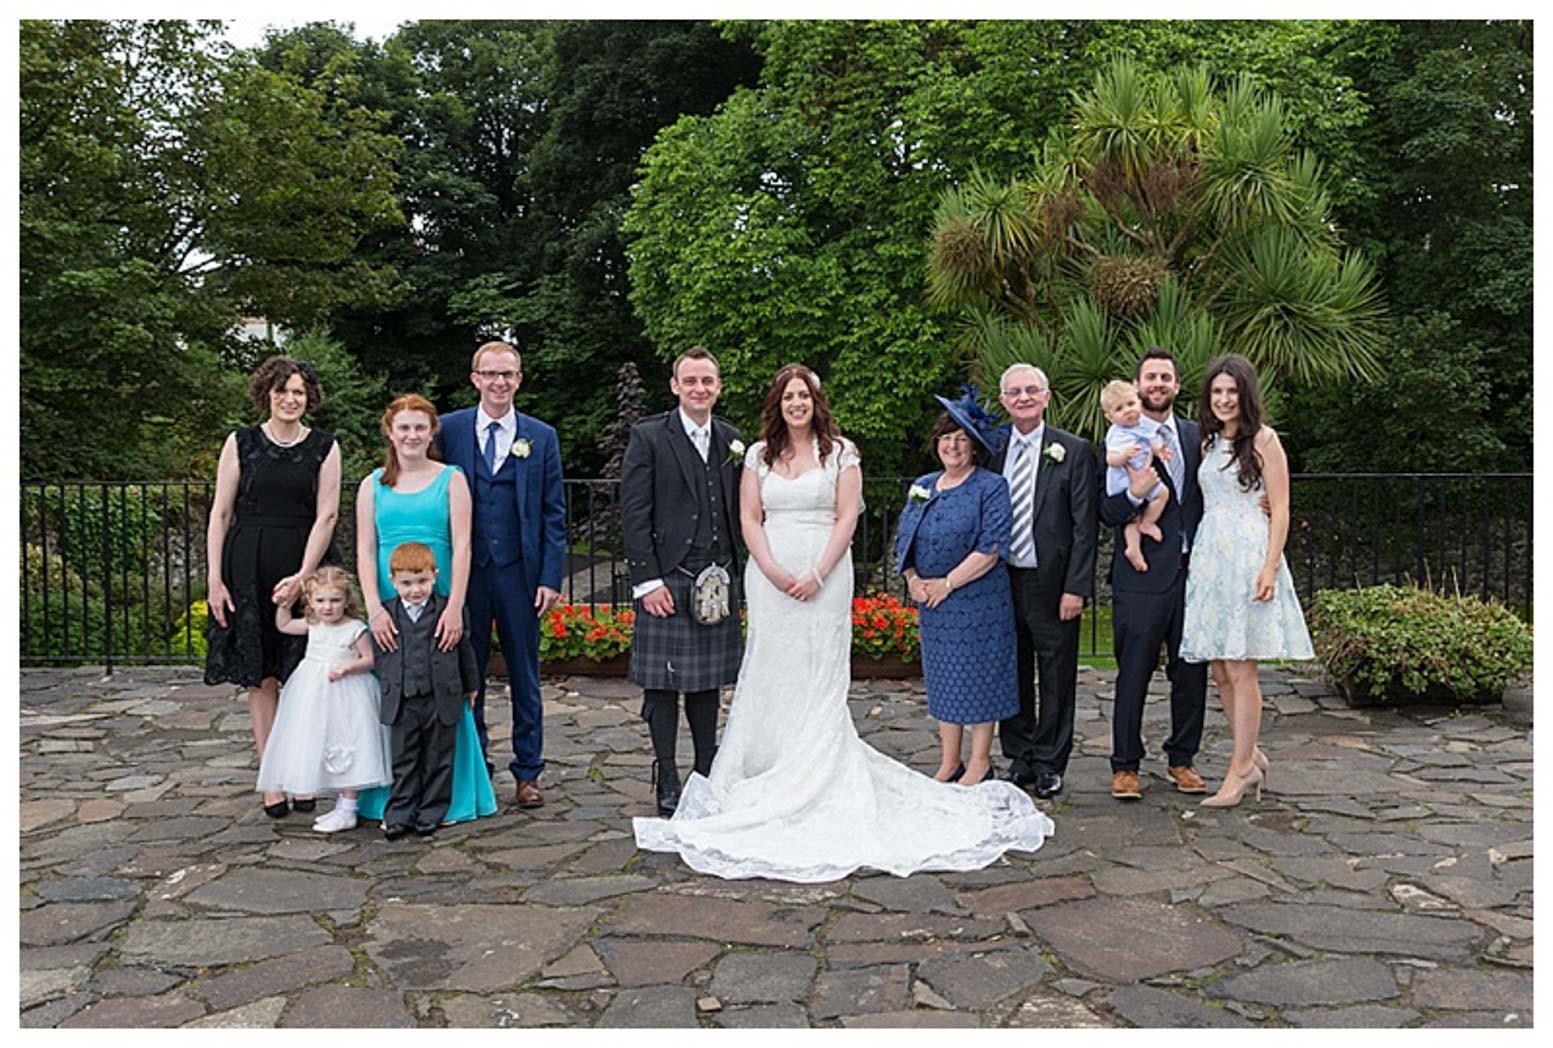 Ballygally Castle Wedding Photographs by Ricky Parker Photography-41